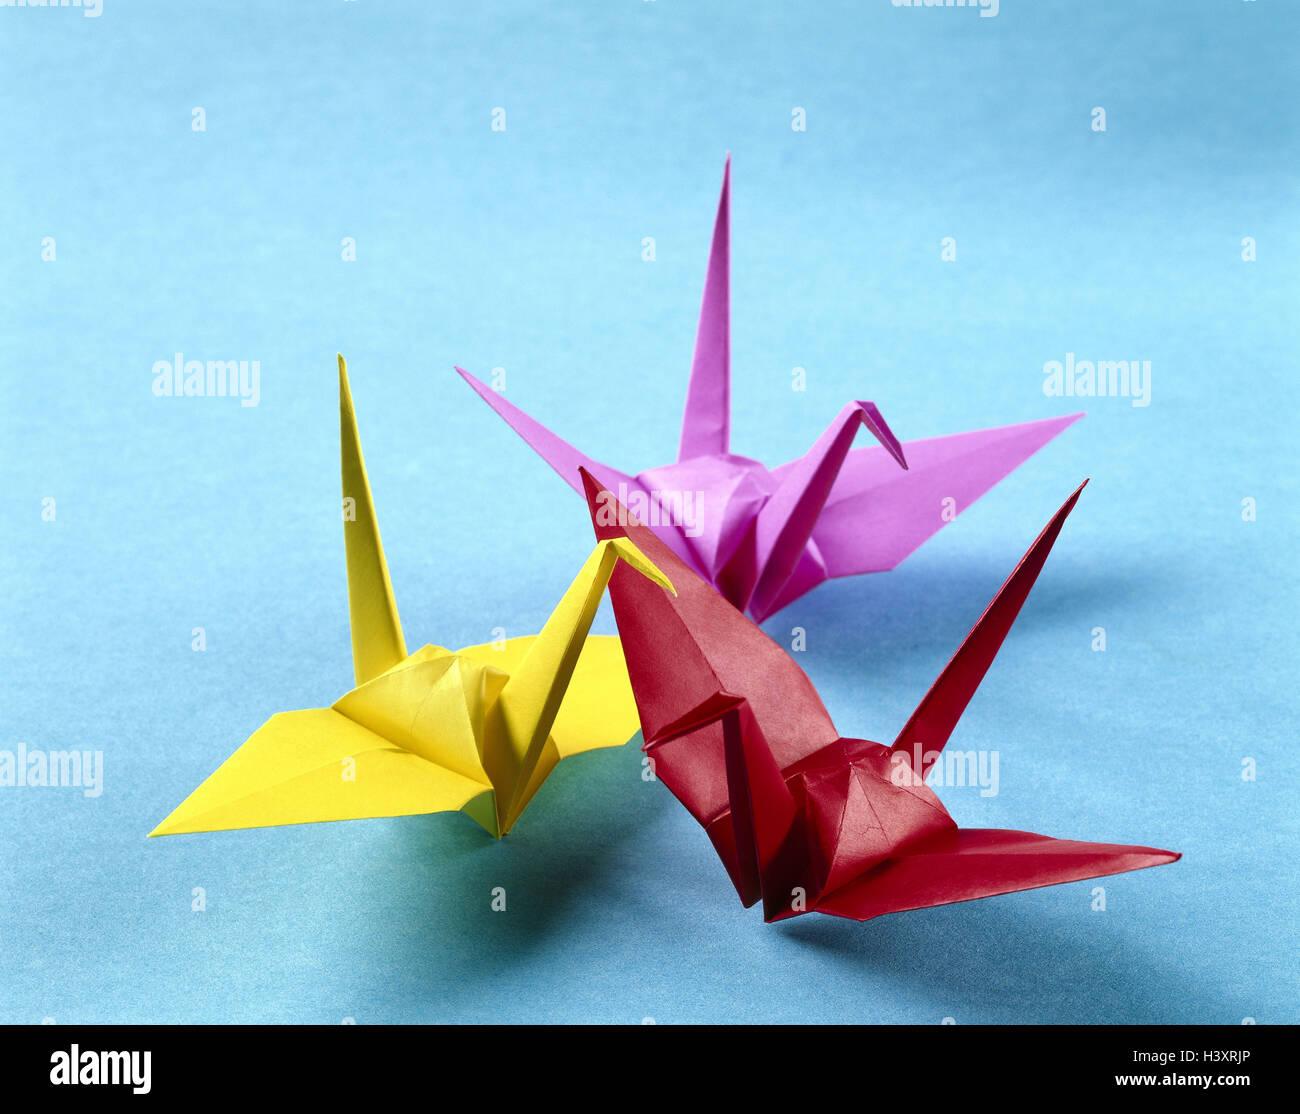 Origami, Japanese paper folding art, animals, birds ... - photo#50